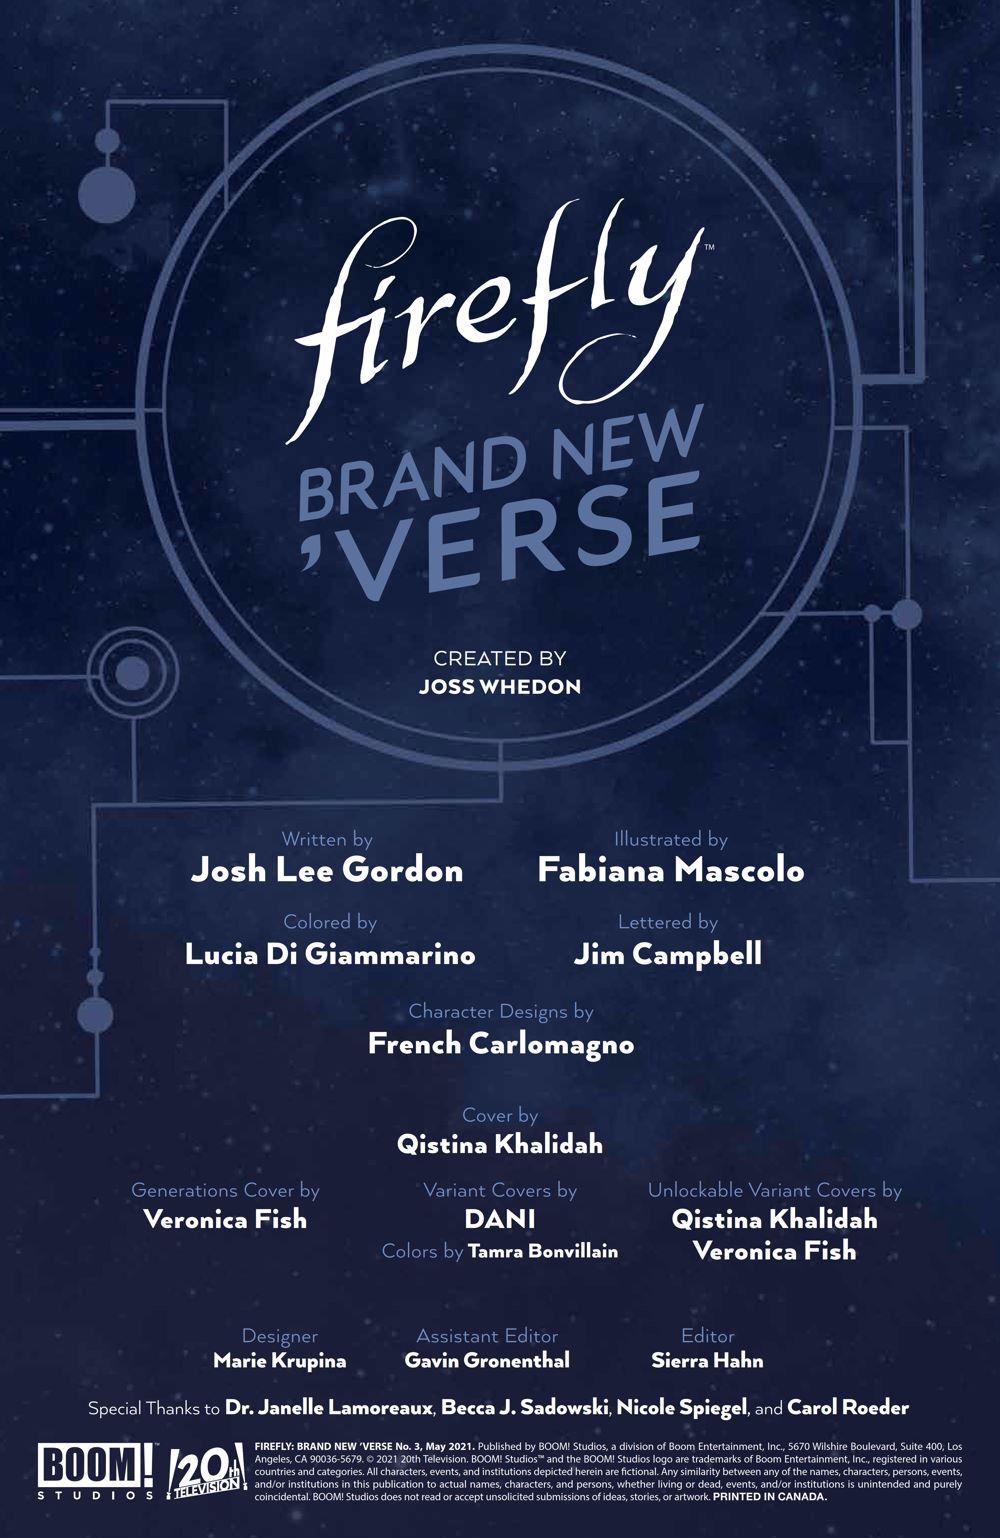 Firefly_BrandNewVerse_003_PRESS_2 ComicList Previews: FIREFLY A BRAND NEW 'VERSE #3 (OF 6)